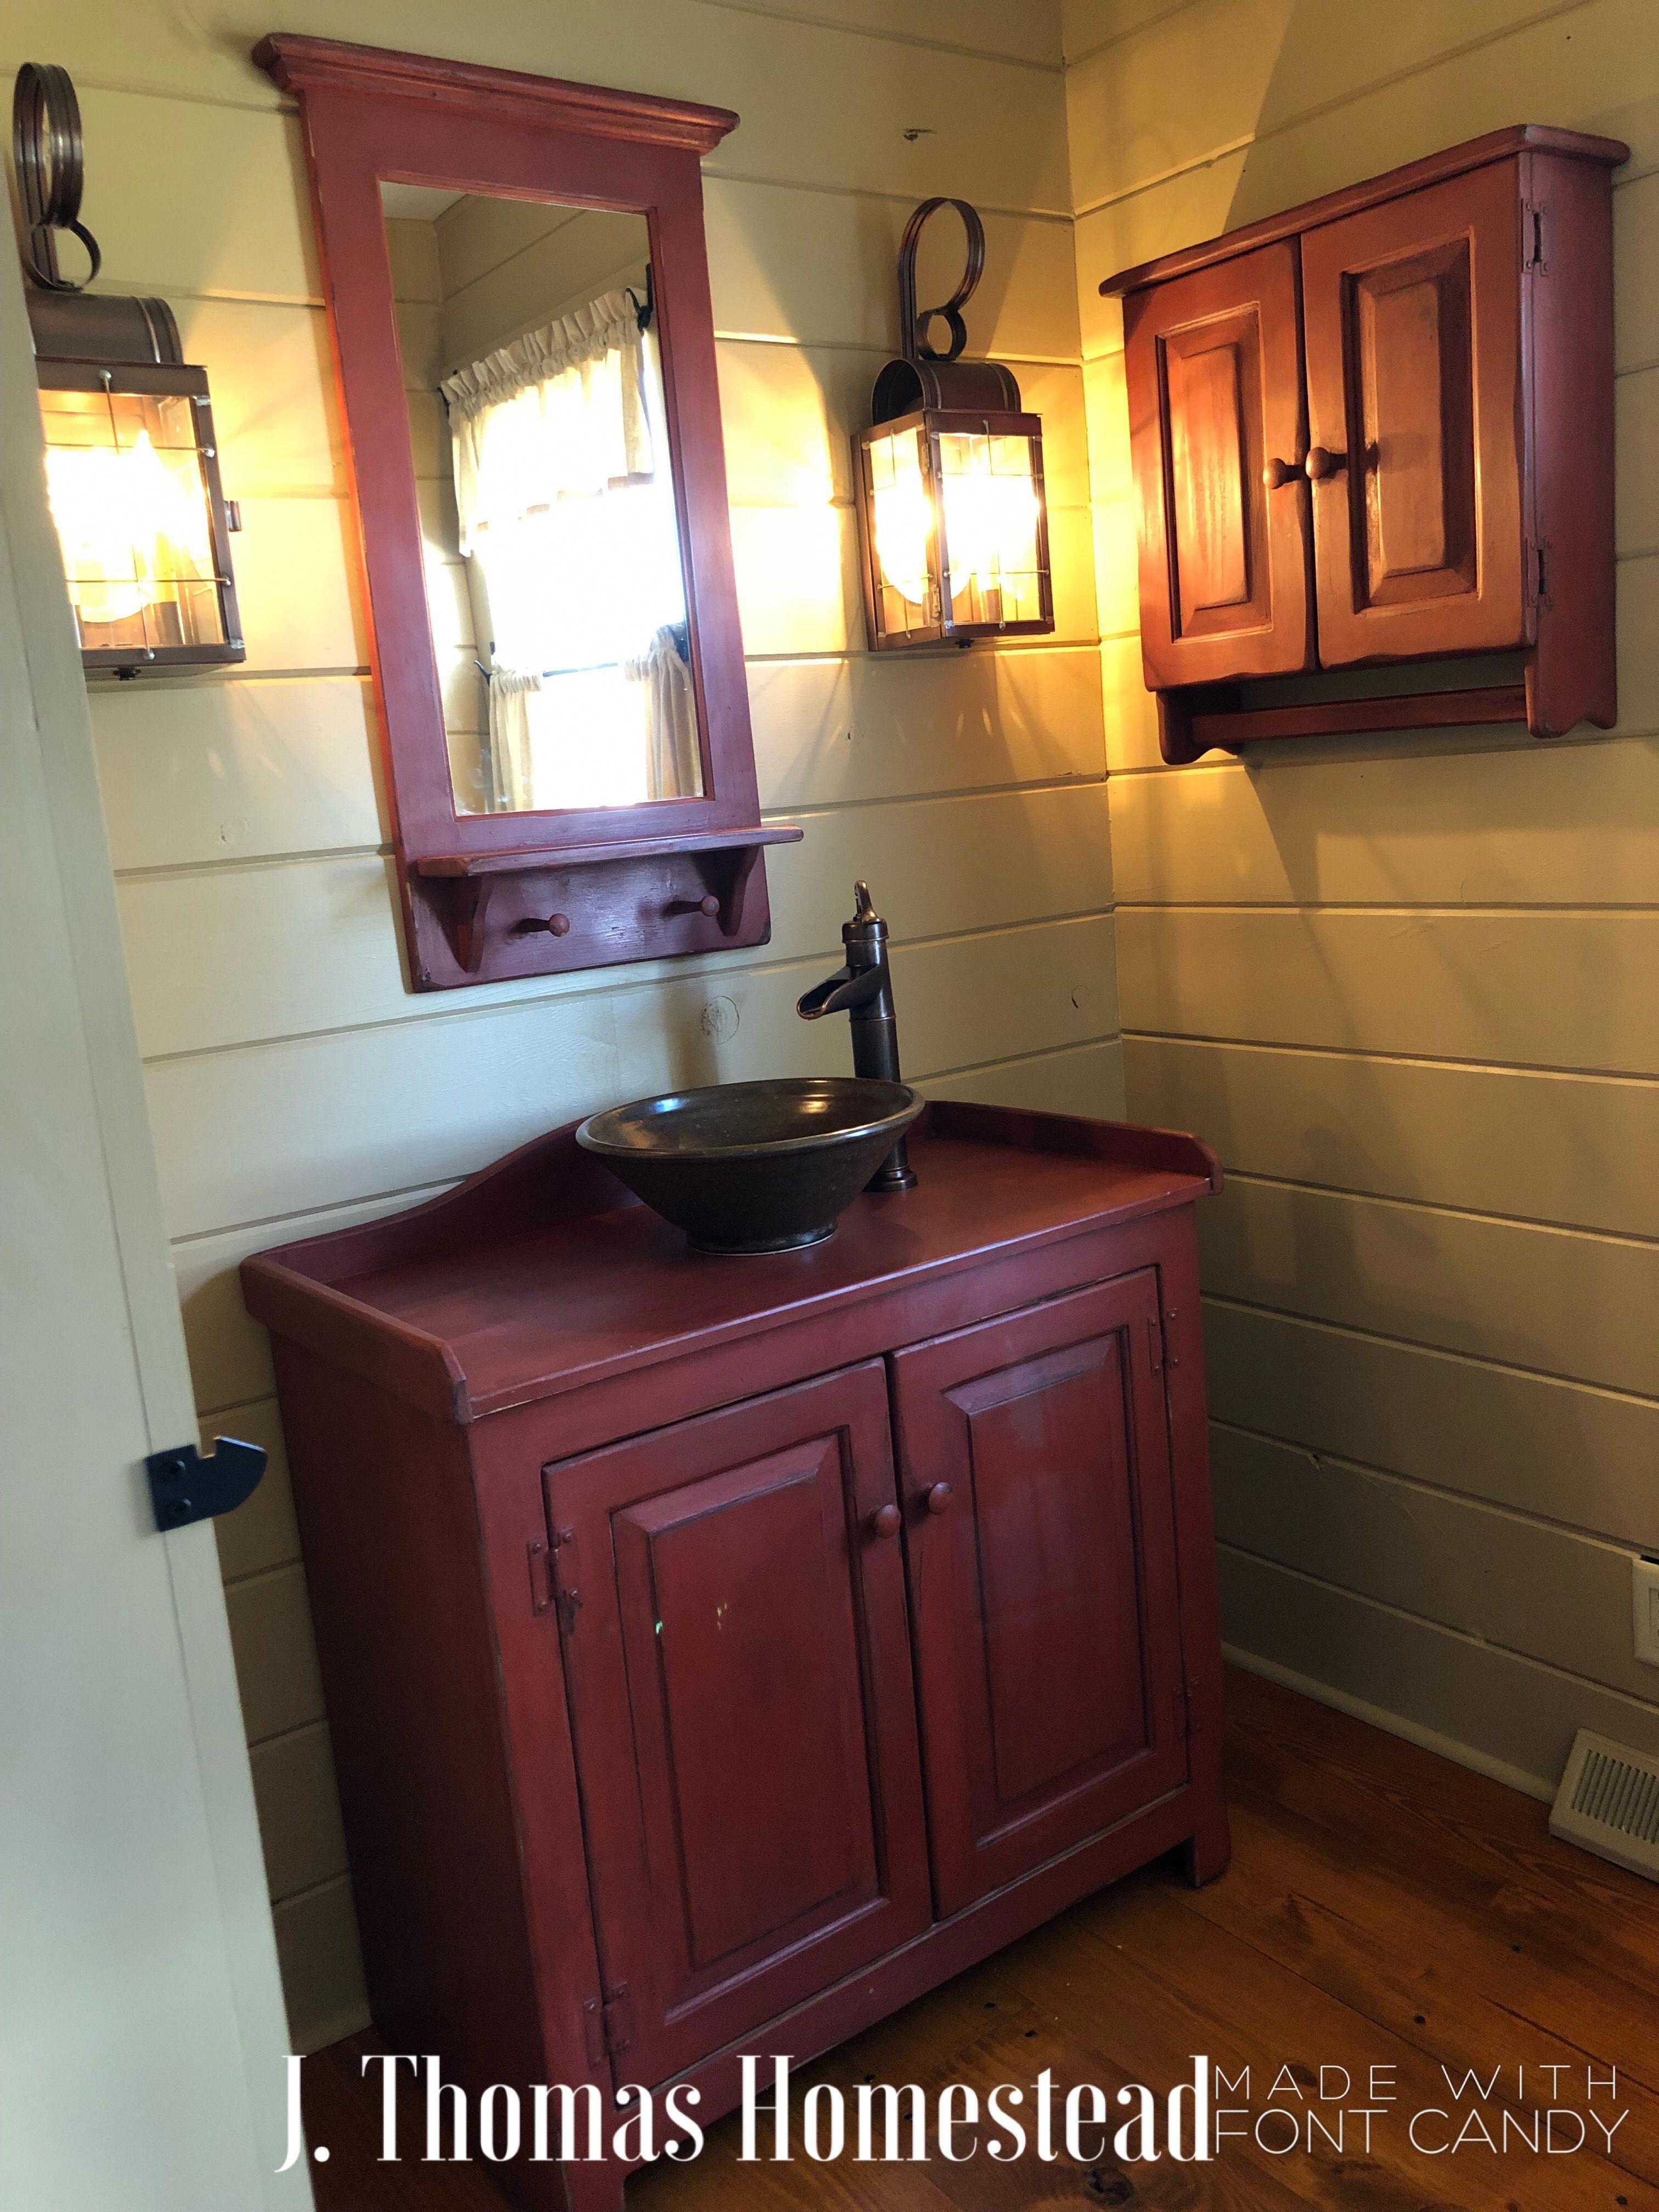 J Thomas Homestead Our Primitive Home Powder Room